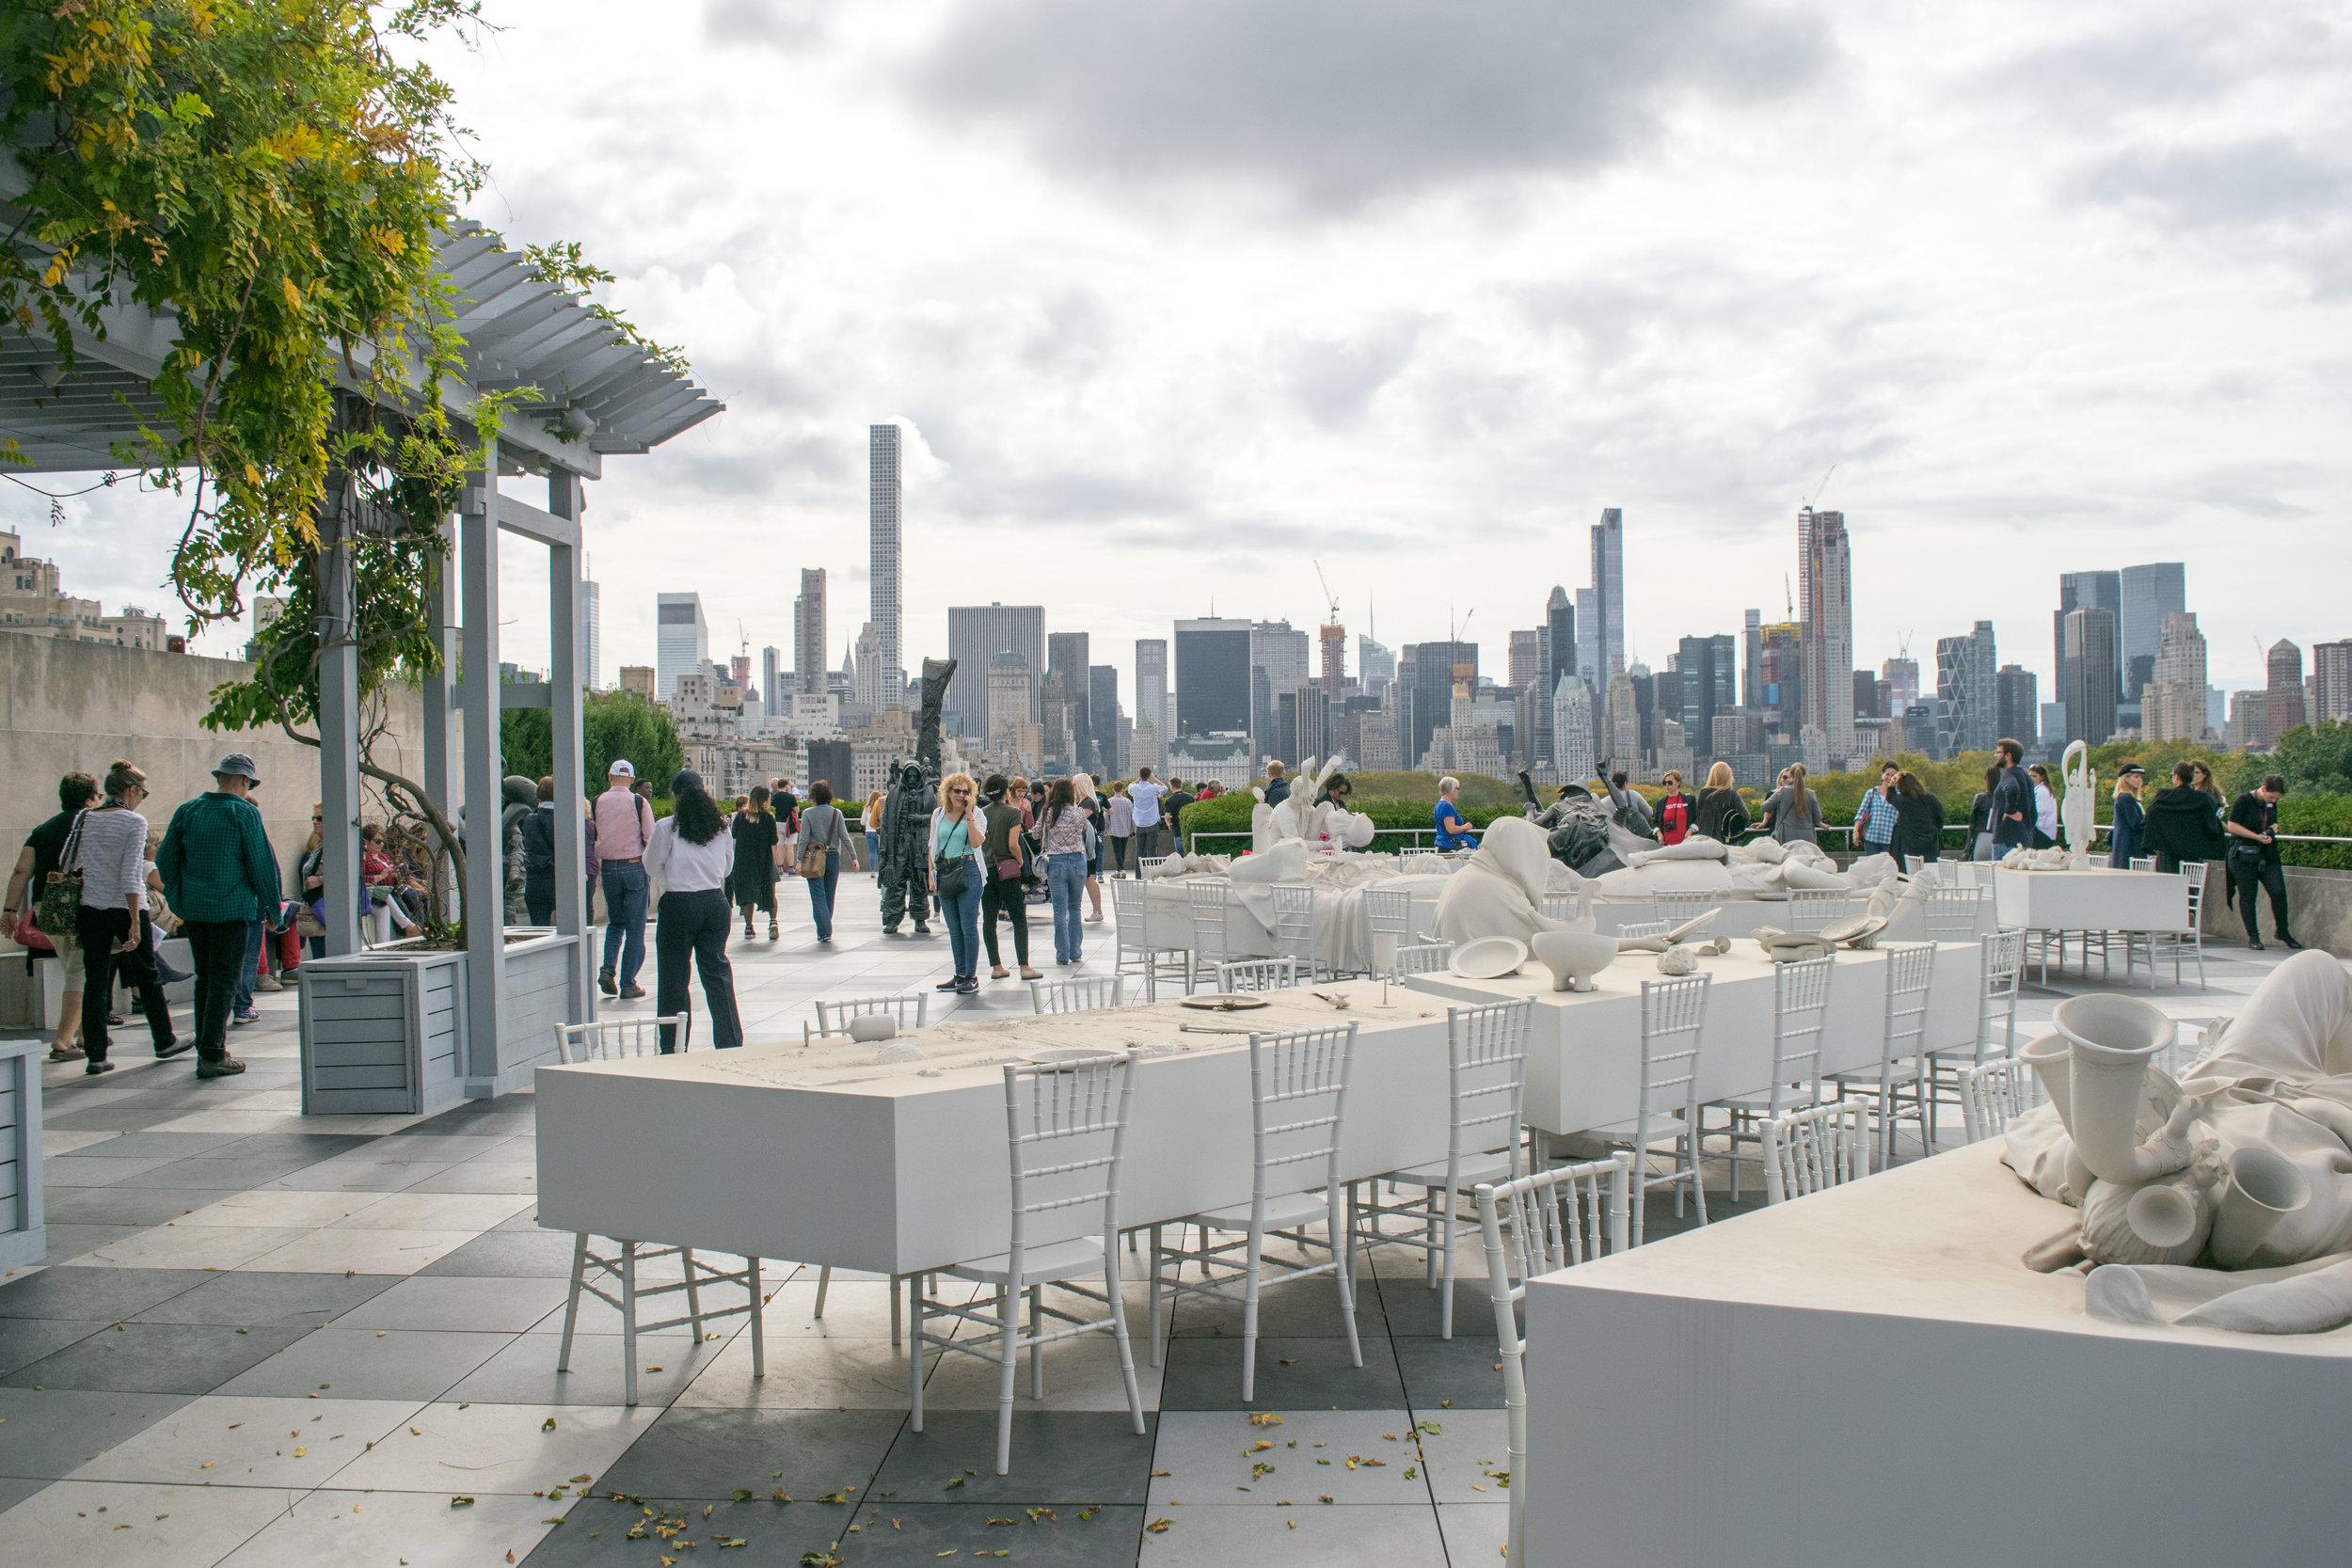 The Cantor Roof Garden Bar at the Metropolitan Museum of Art